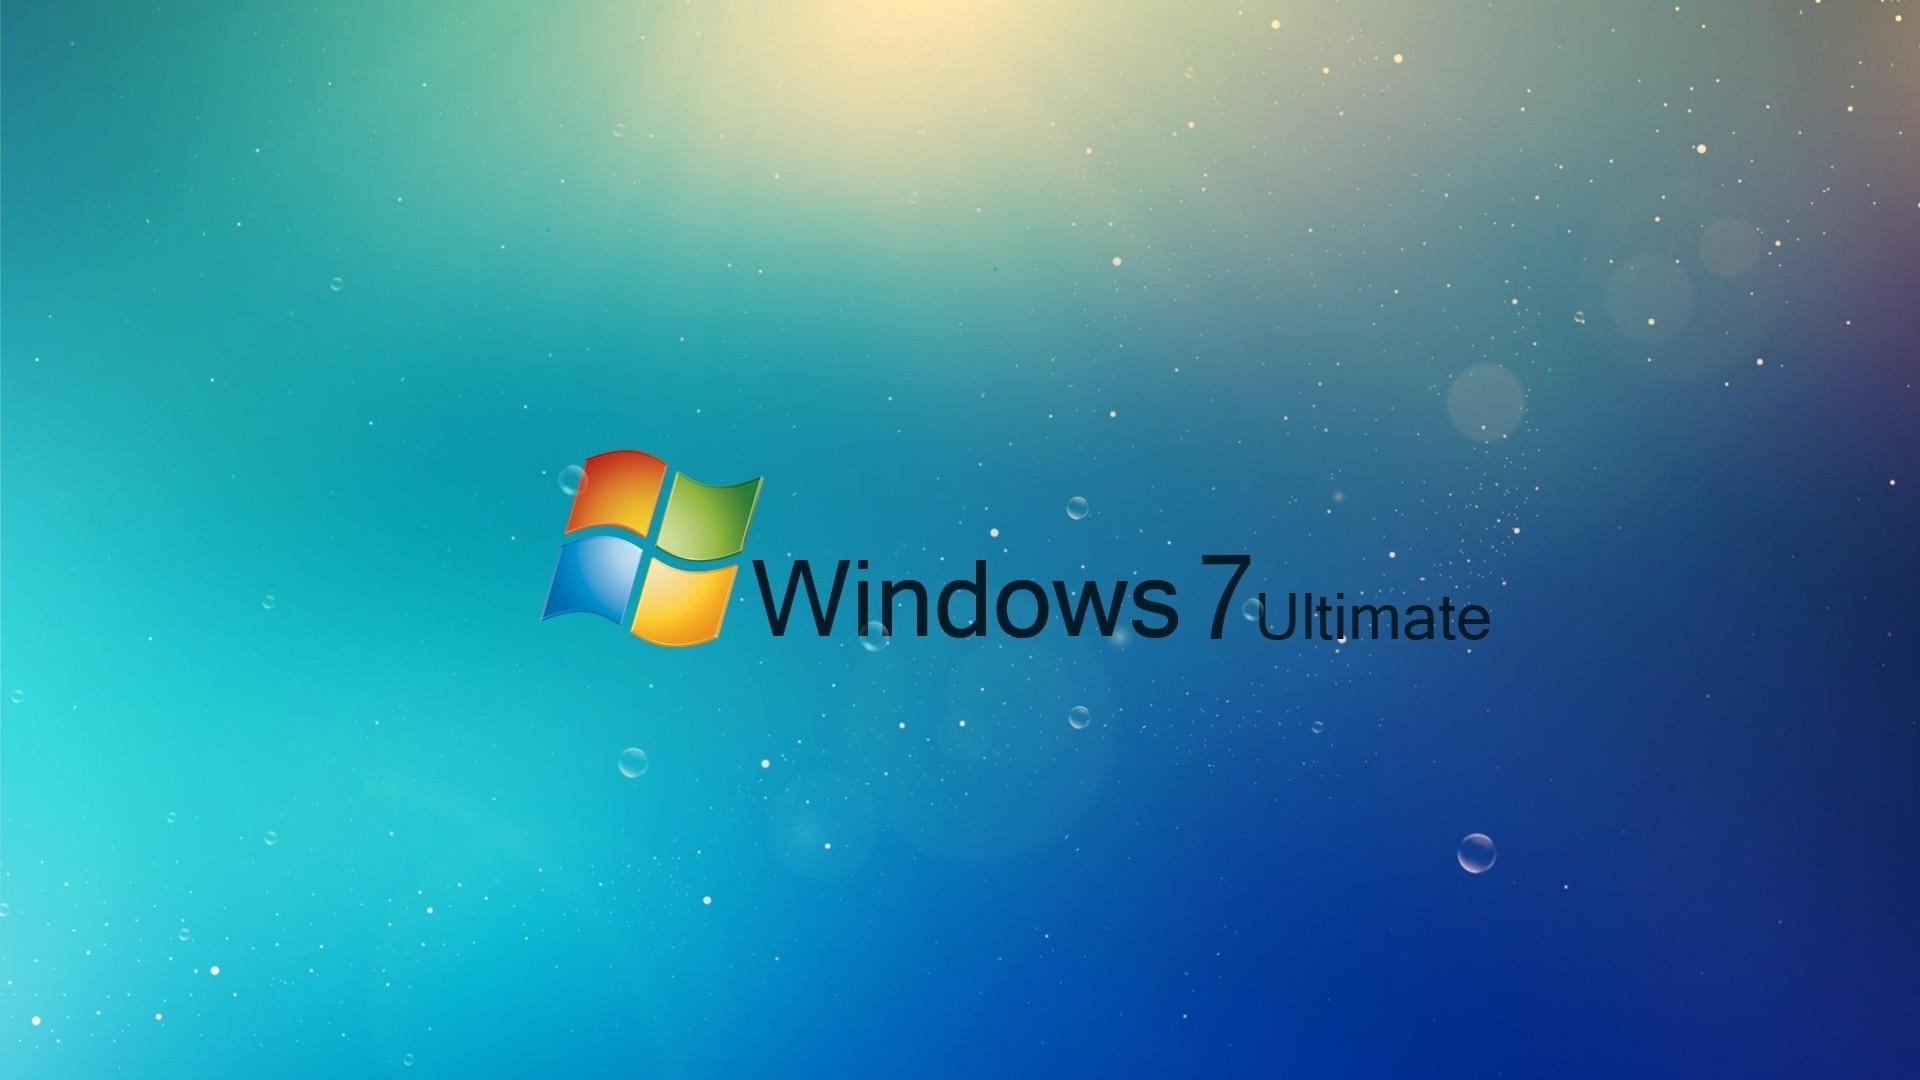 Wallpaper windows 7, ultimate, blue, drops